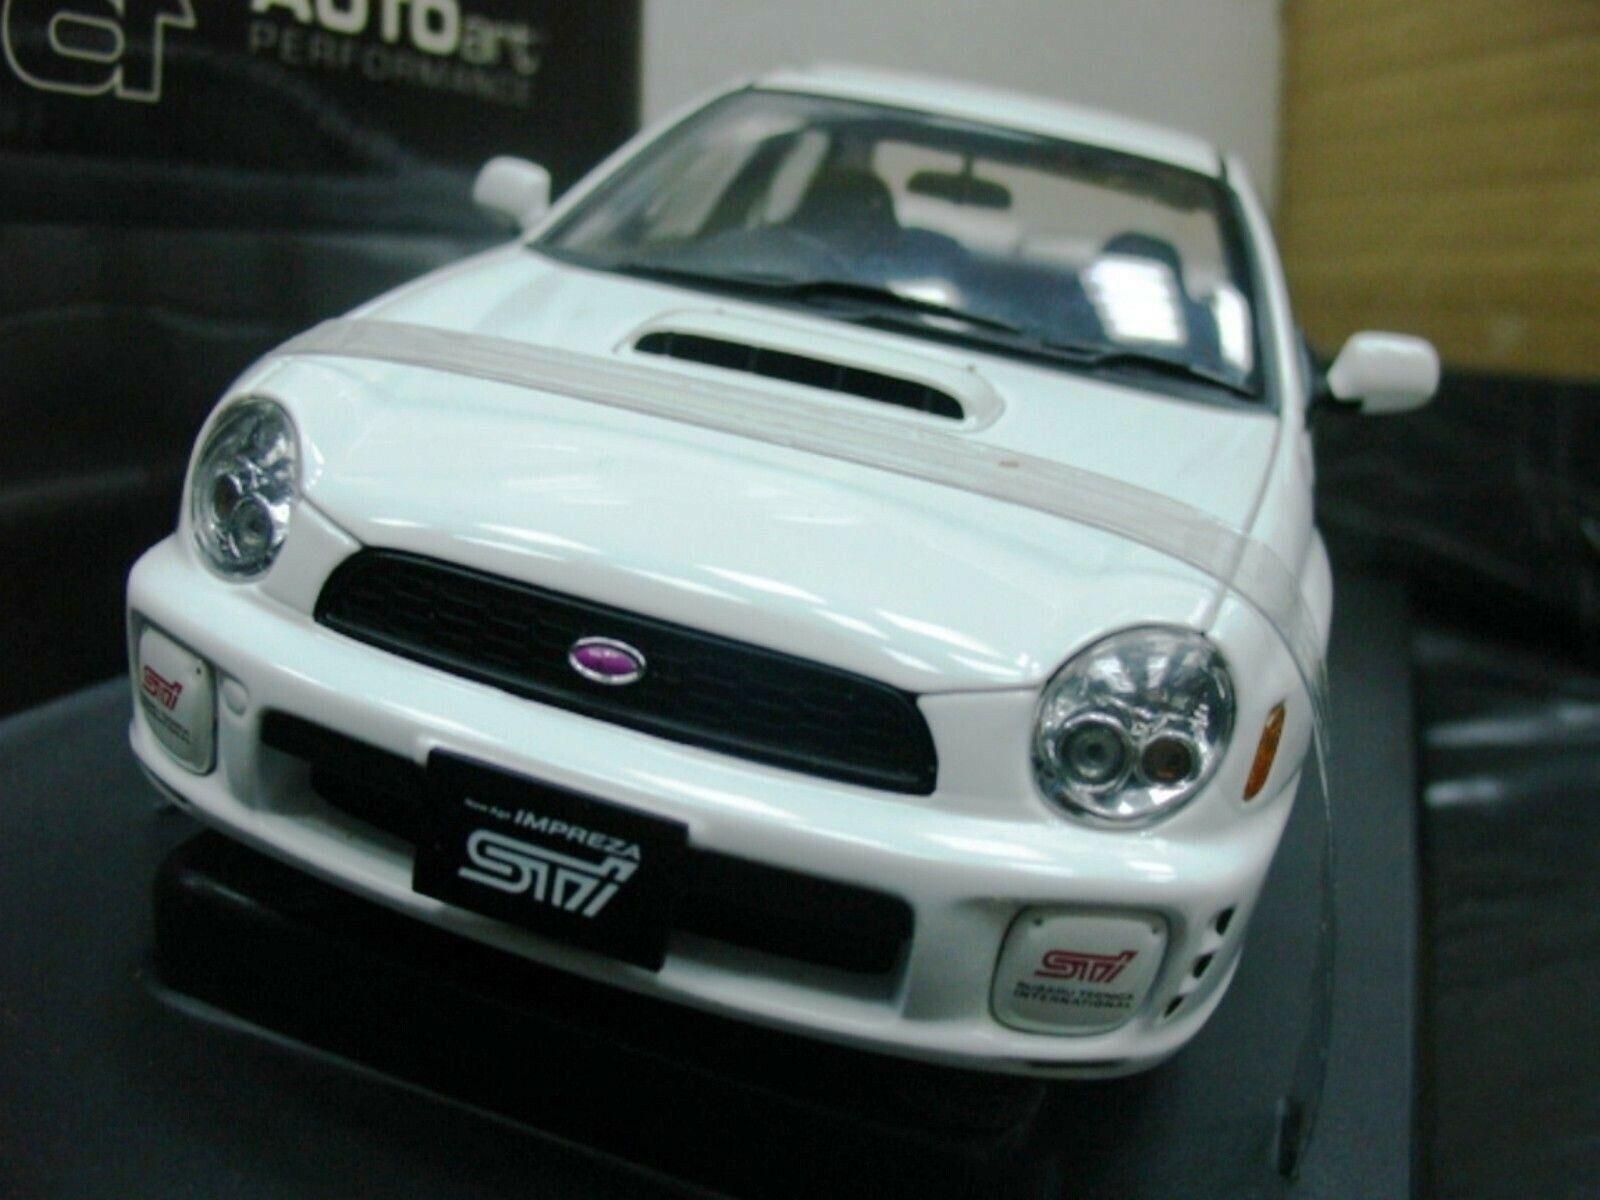 WOW estremamente raro SUBARU IMPREZA WRX STI 2001 RHD Bianco 1 18 AUTO Art-WRC 2006